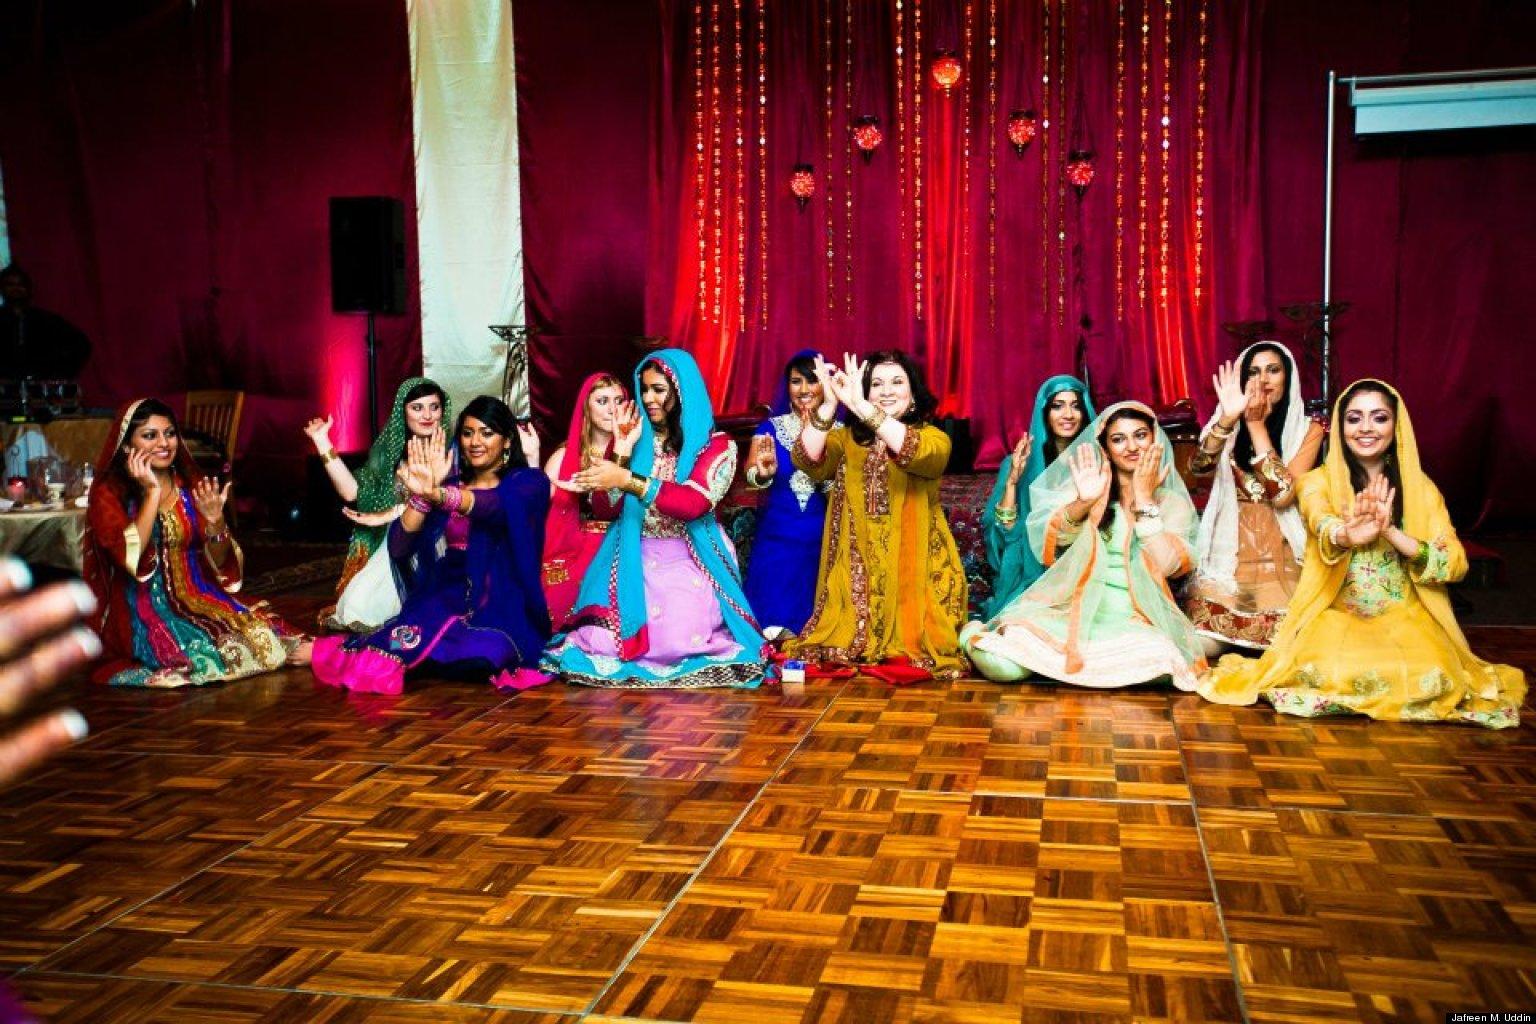 Mehndi Ceremony S Dailymotion : Mehndi ceremonies the world s first bridal shower